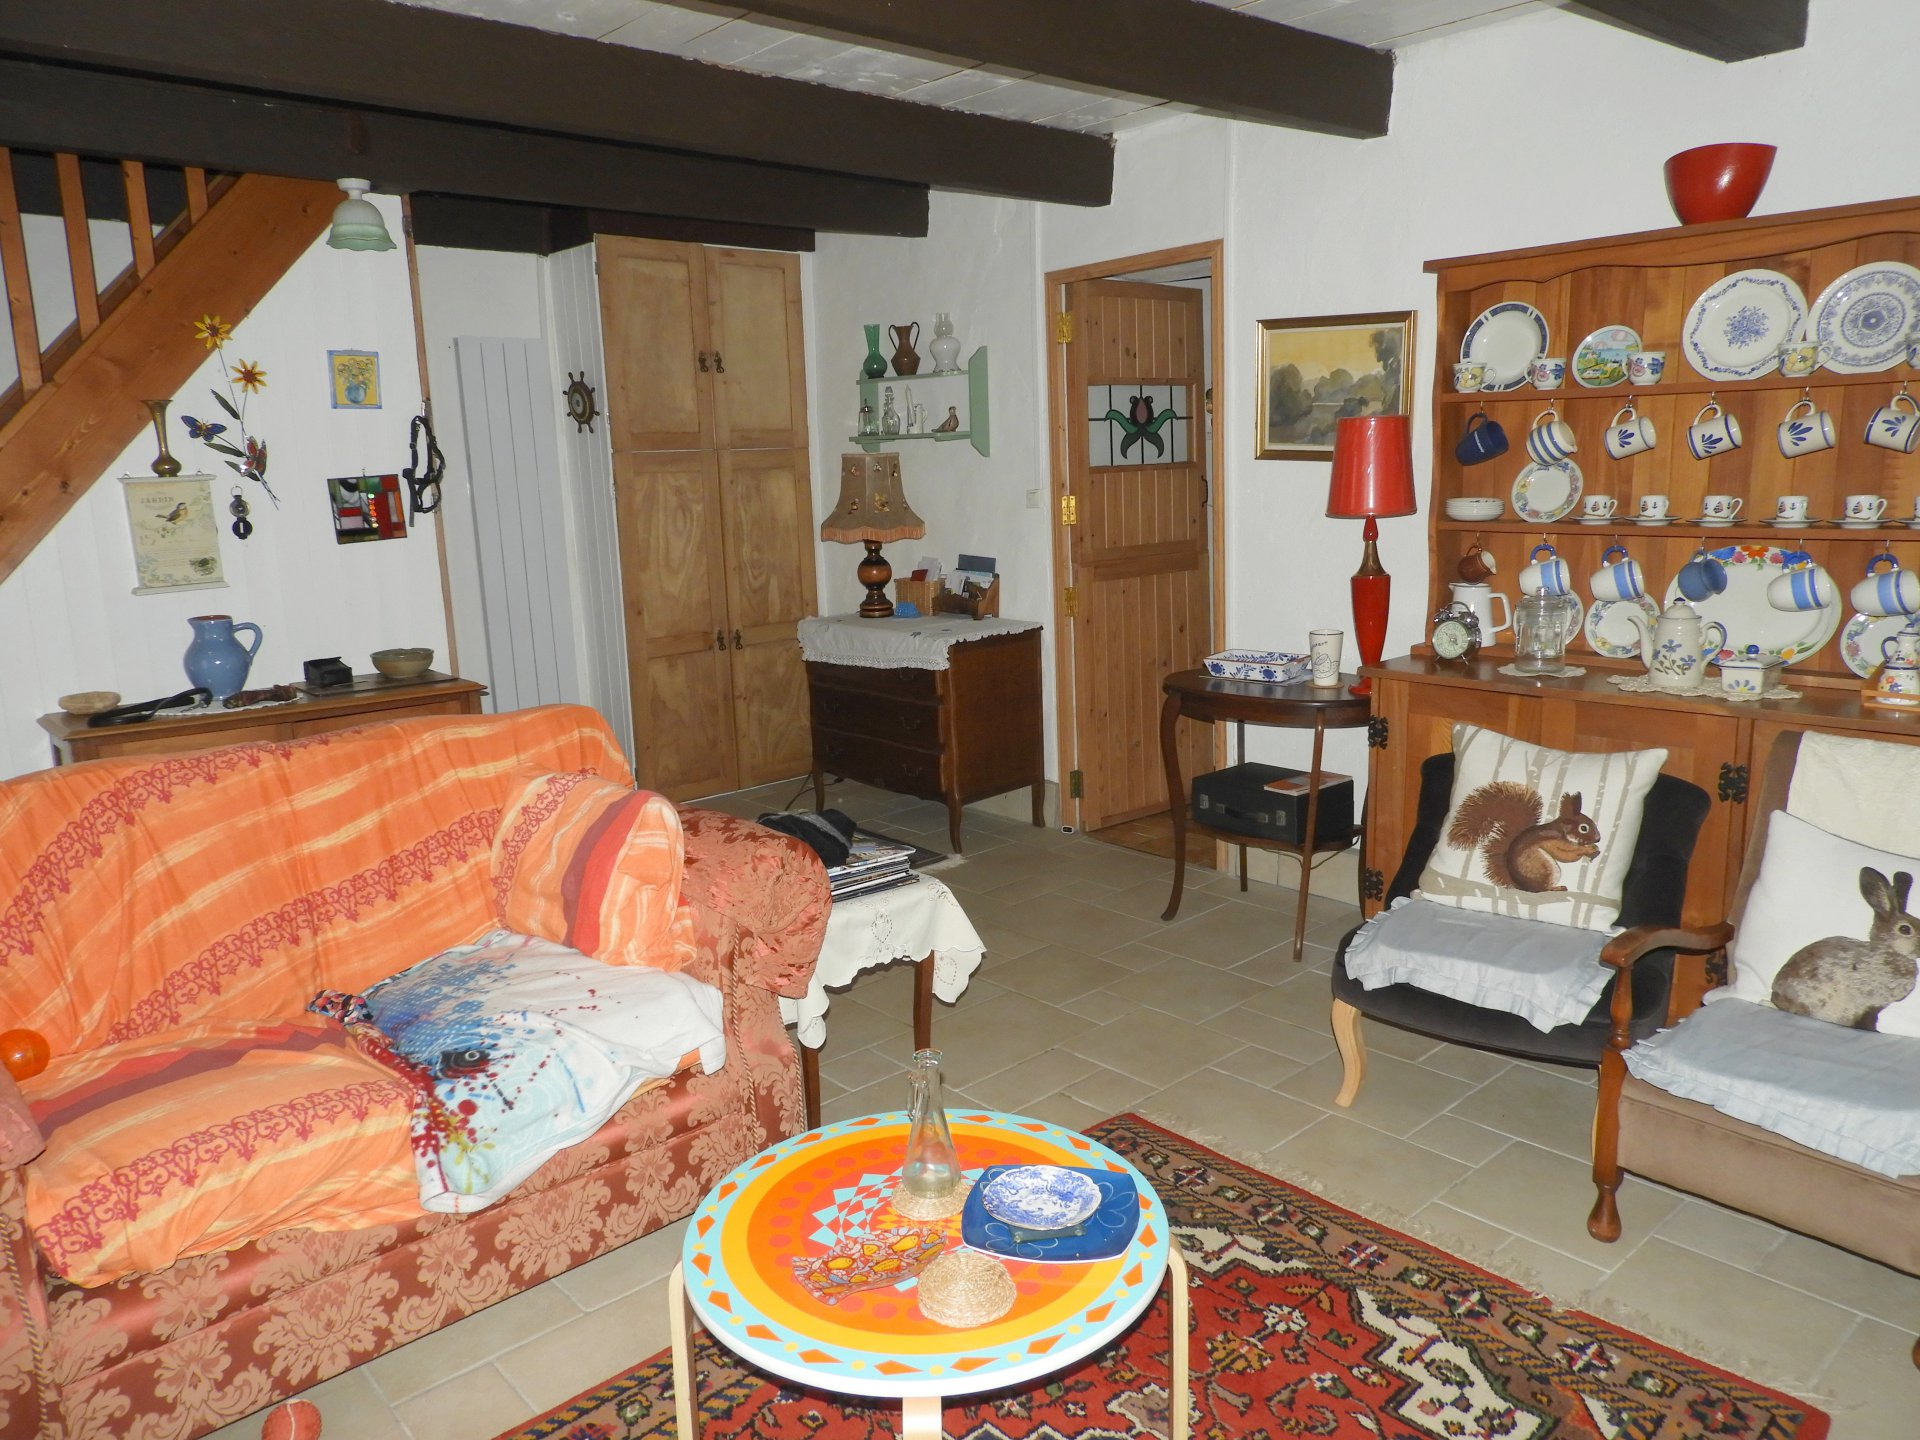 Jolie maison campagnarde au bourg de Maël-Carhaix